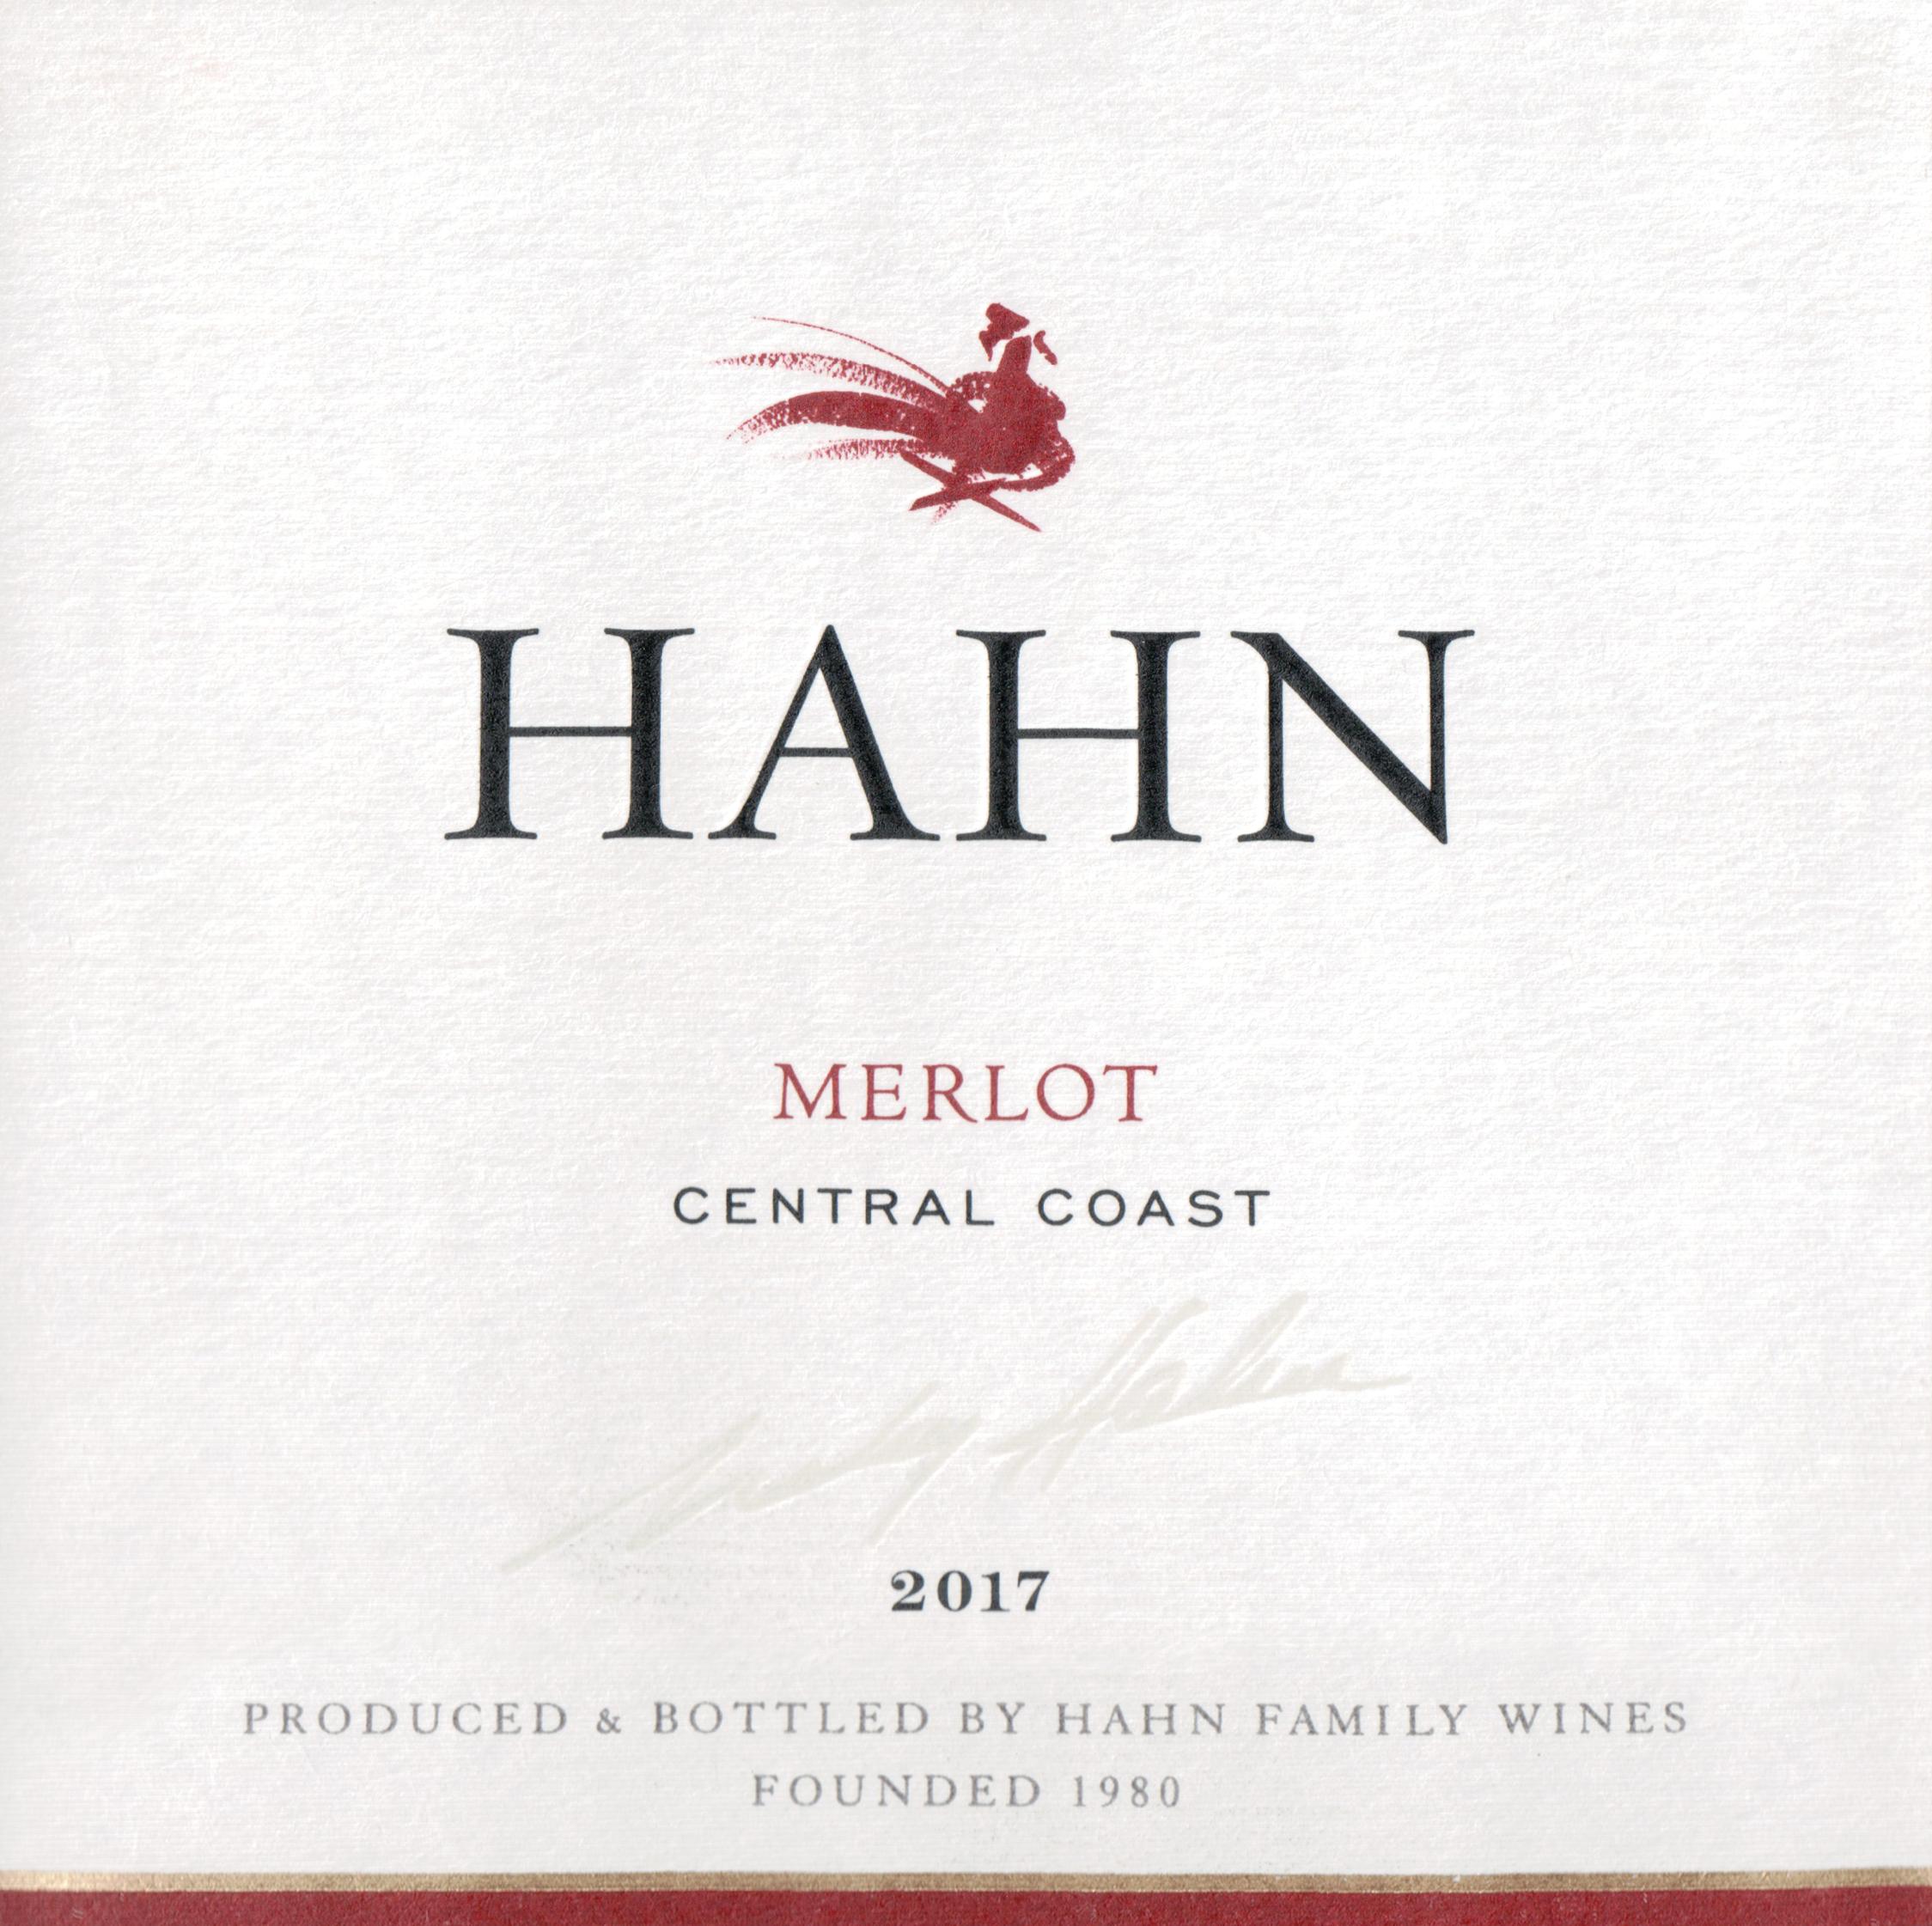 Hahn Estate Merlot 2017